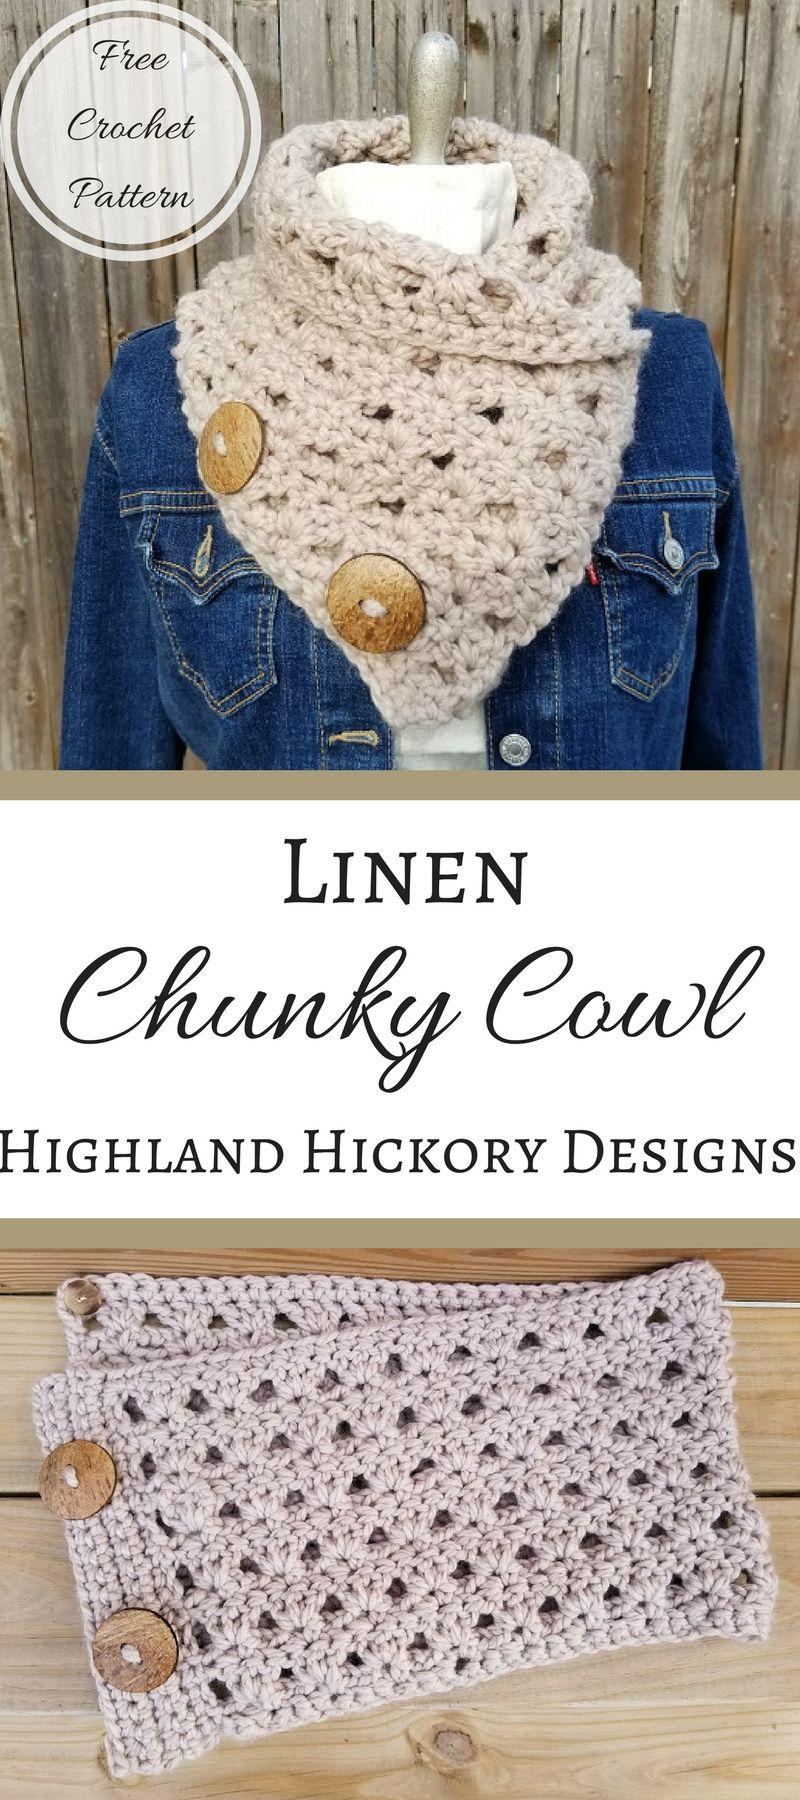 Linen Chunky Cowl | Crochet | Pinterest | Tejido, Gorros y Ganchillo